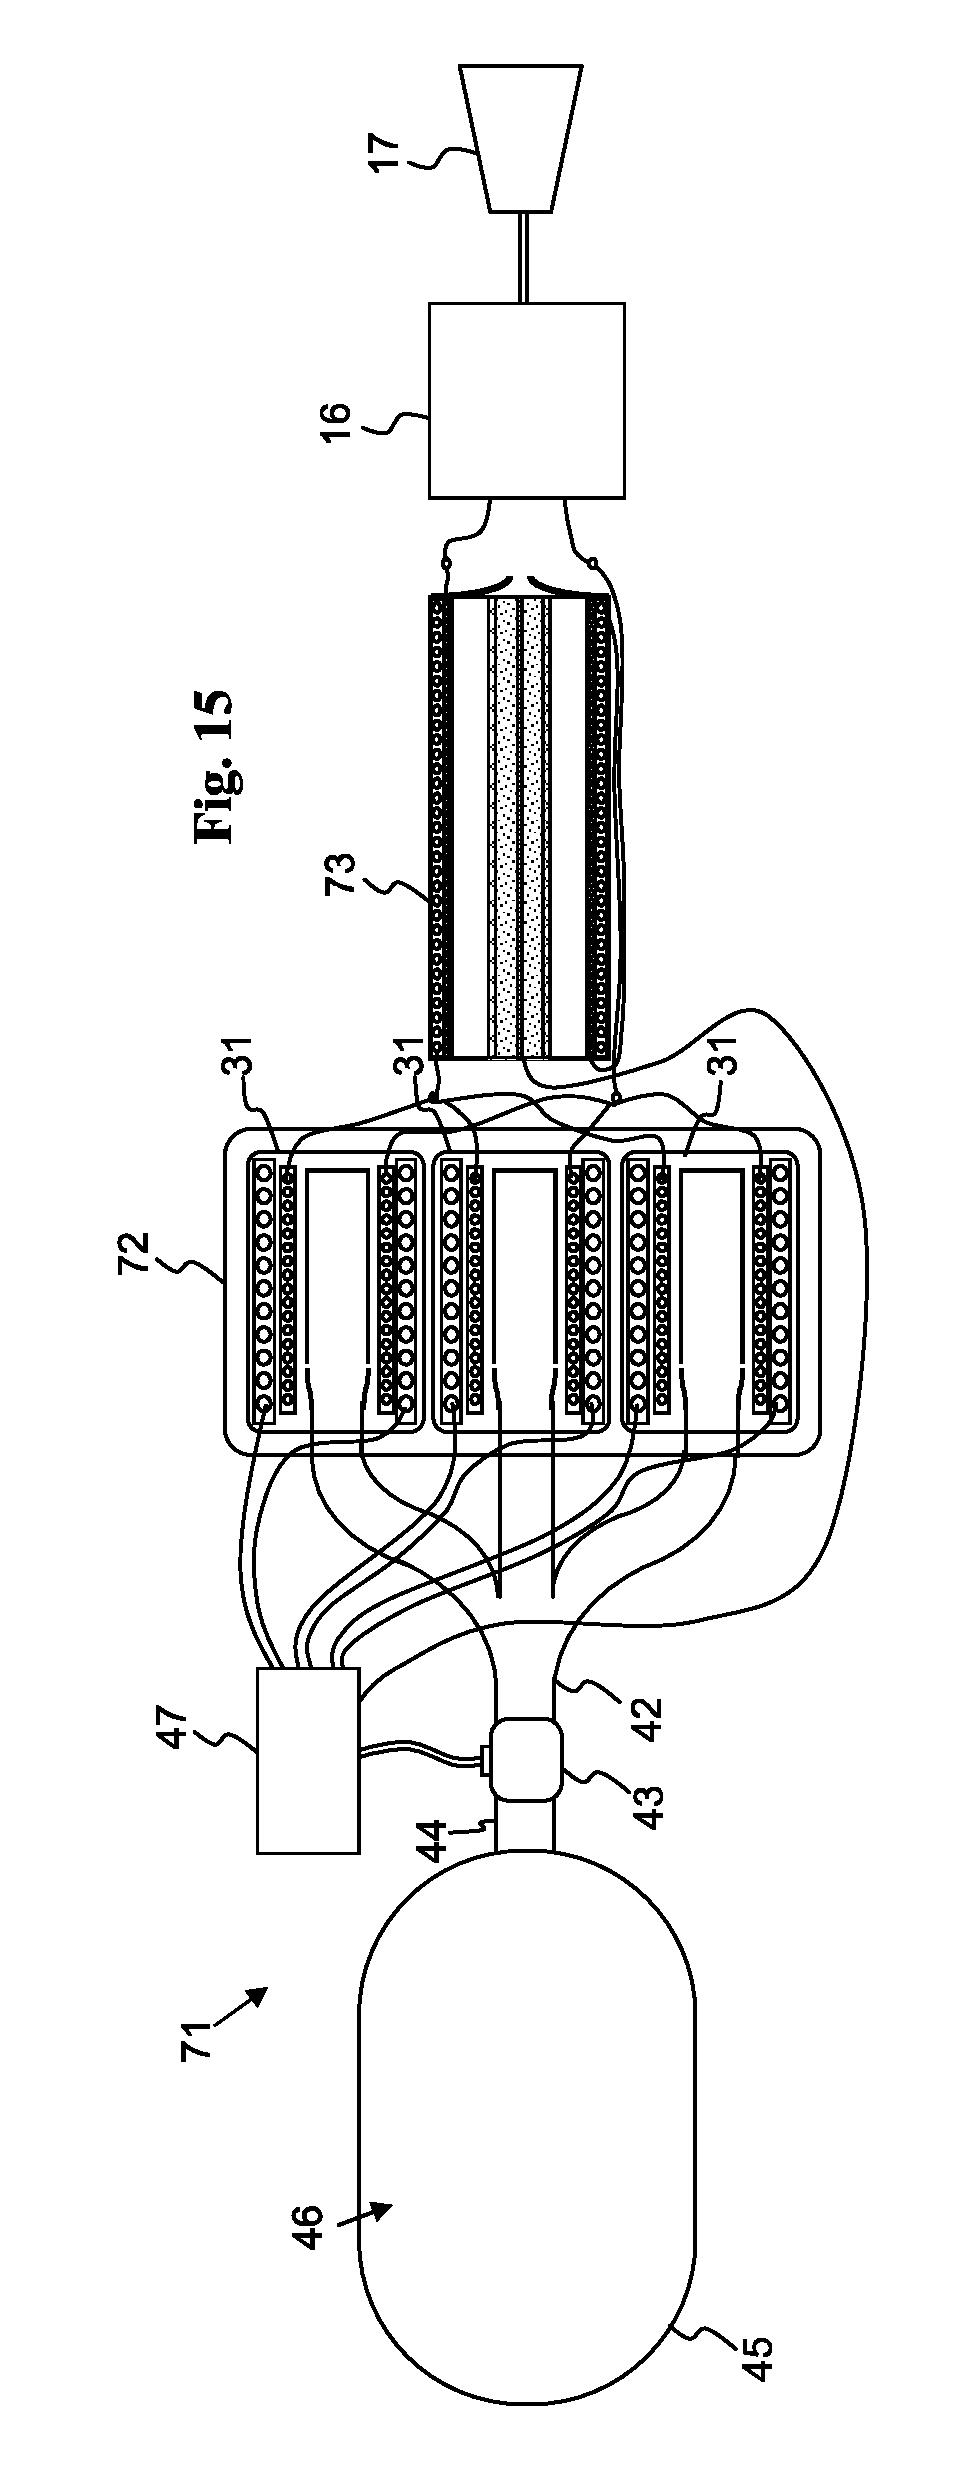 patent us20120326527 - electromagnetic pulse generator